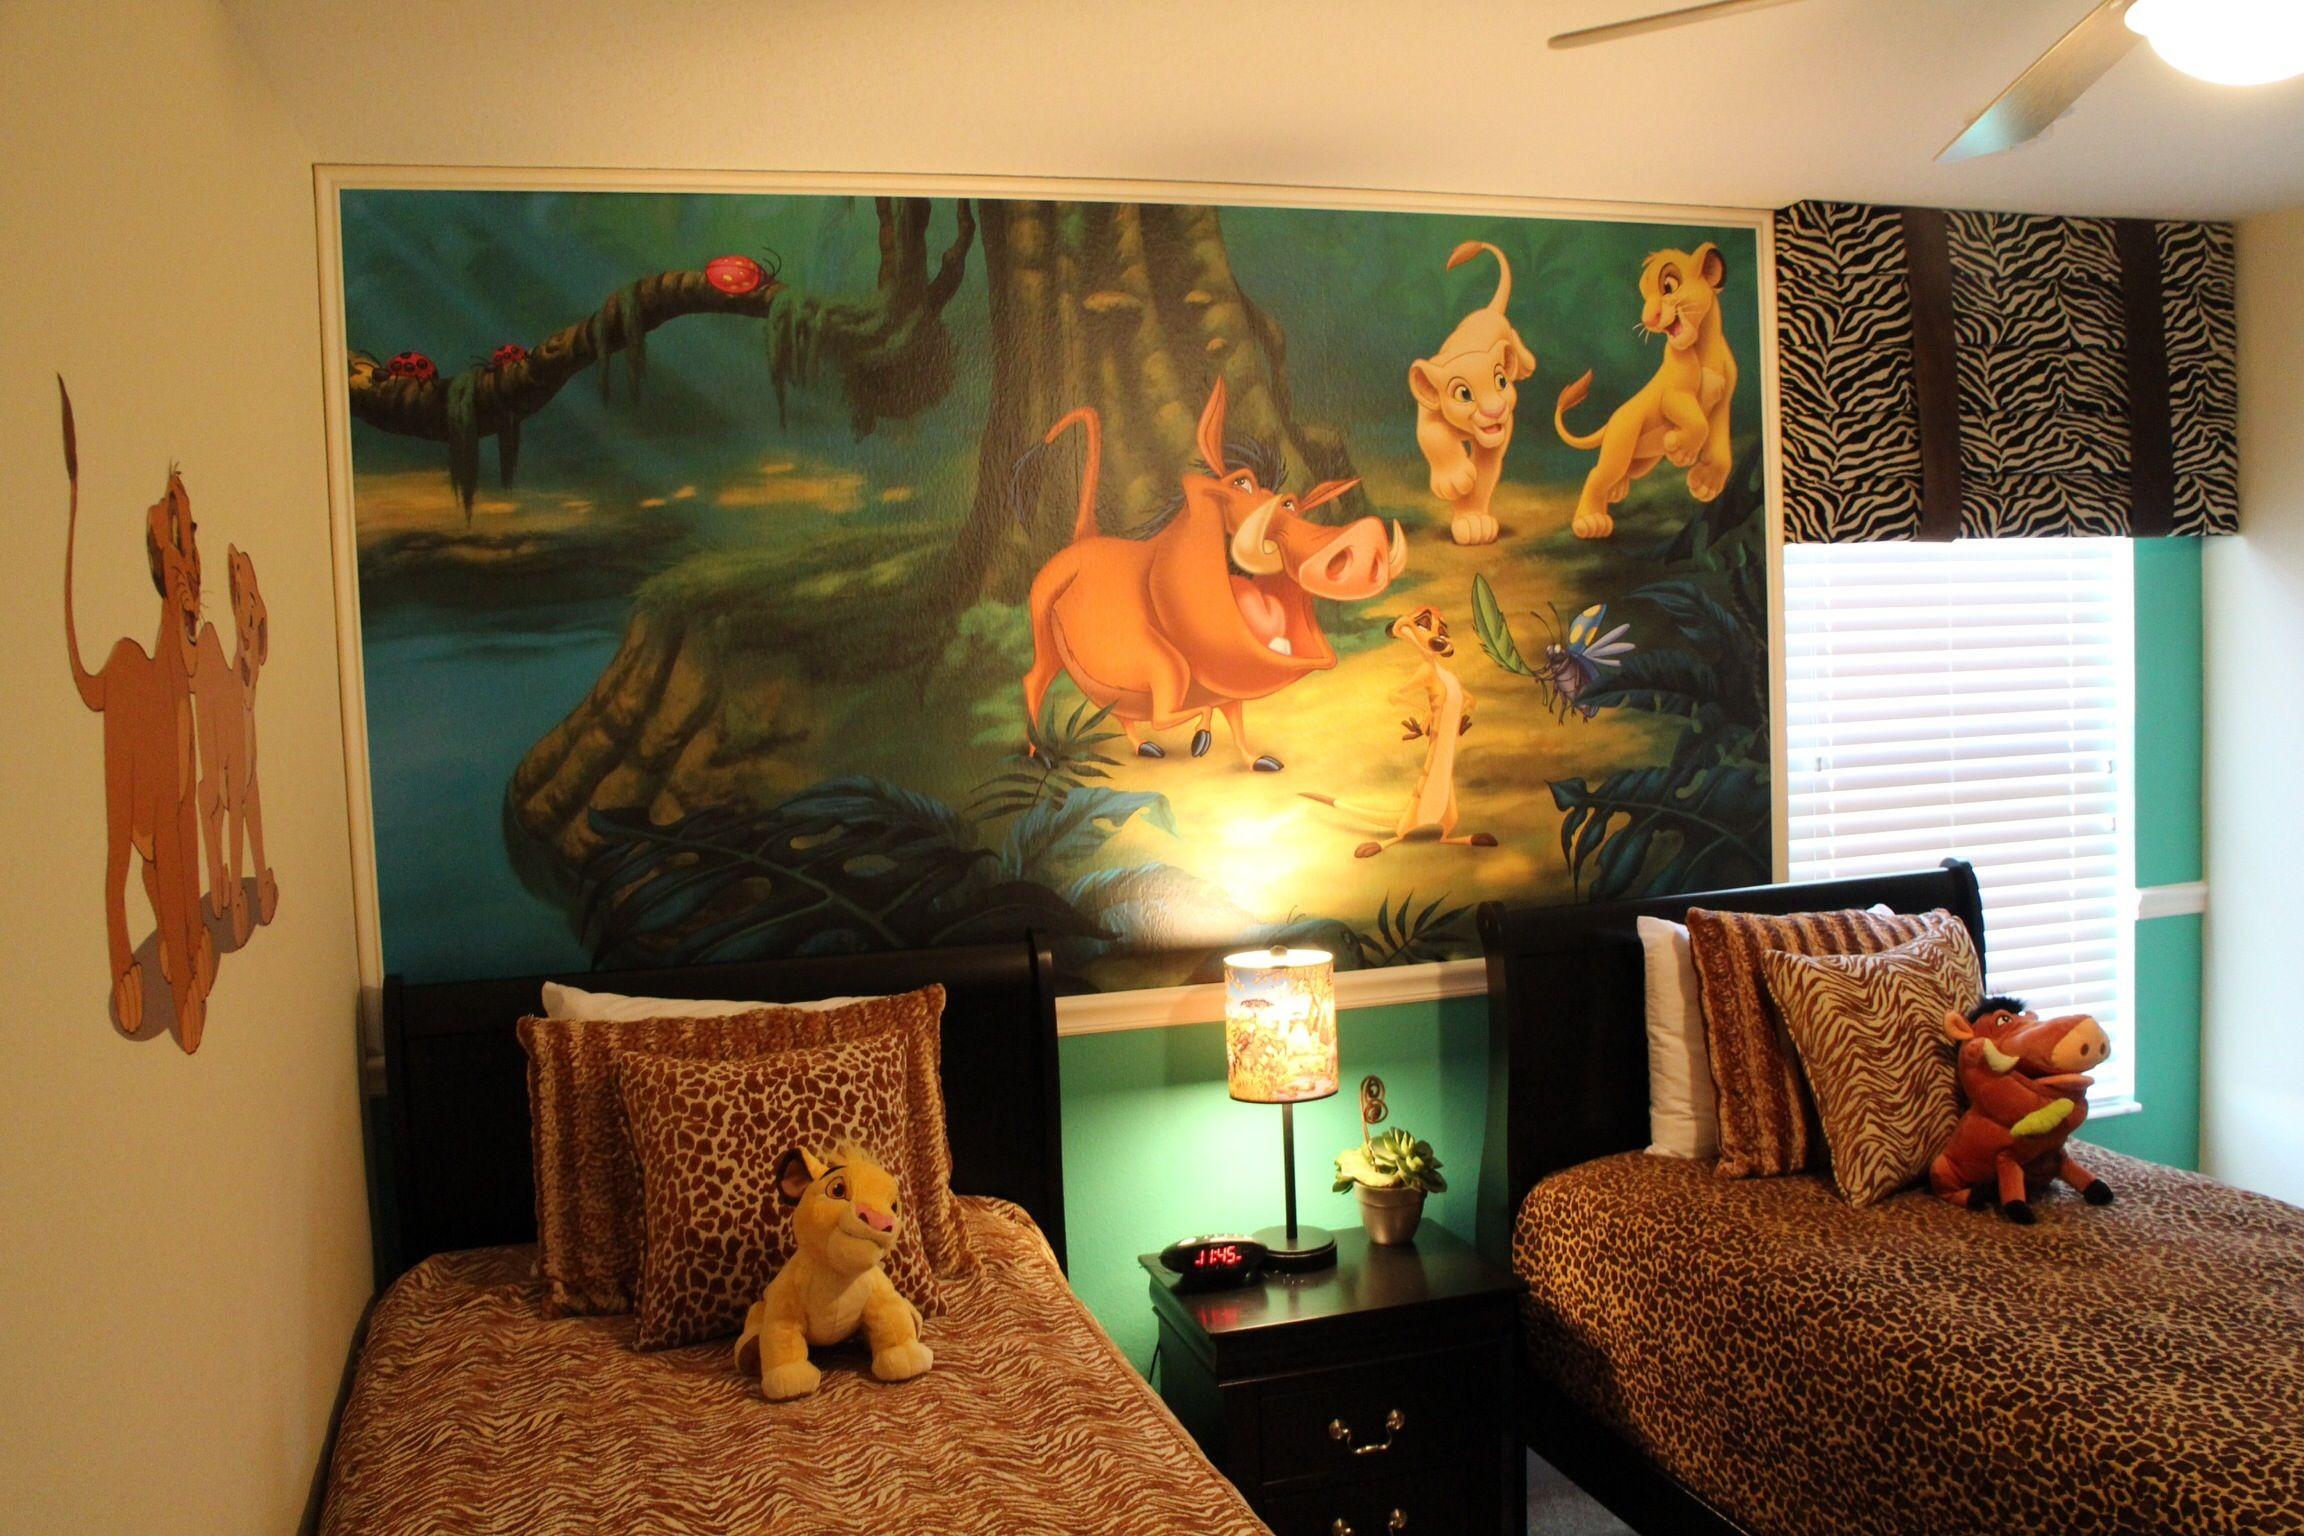 Lion King Wallpaper For Bedroom Hd. Lion King Wallpaper For Bedroom Home  Design